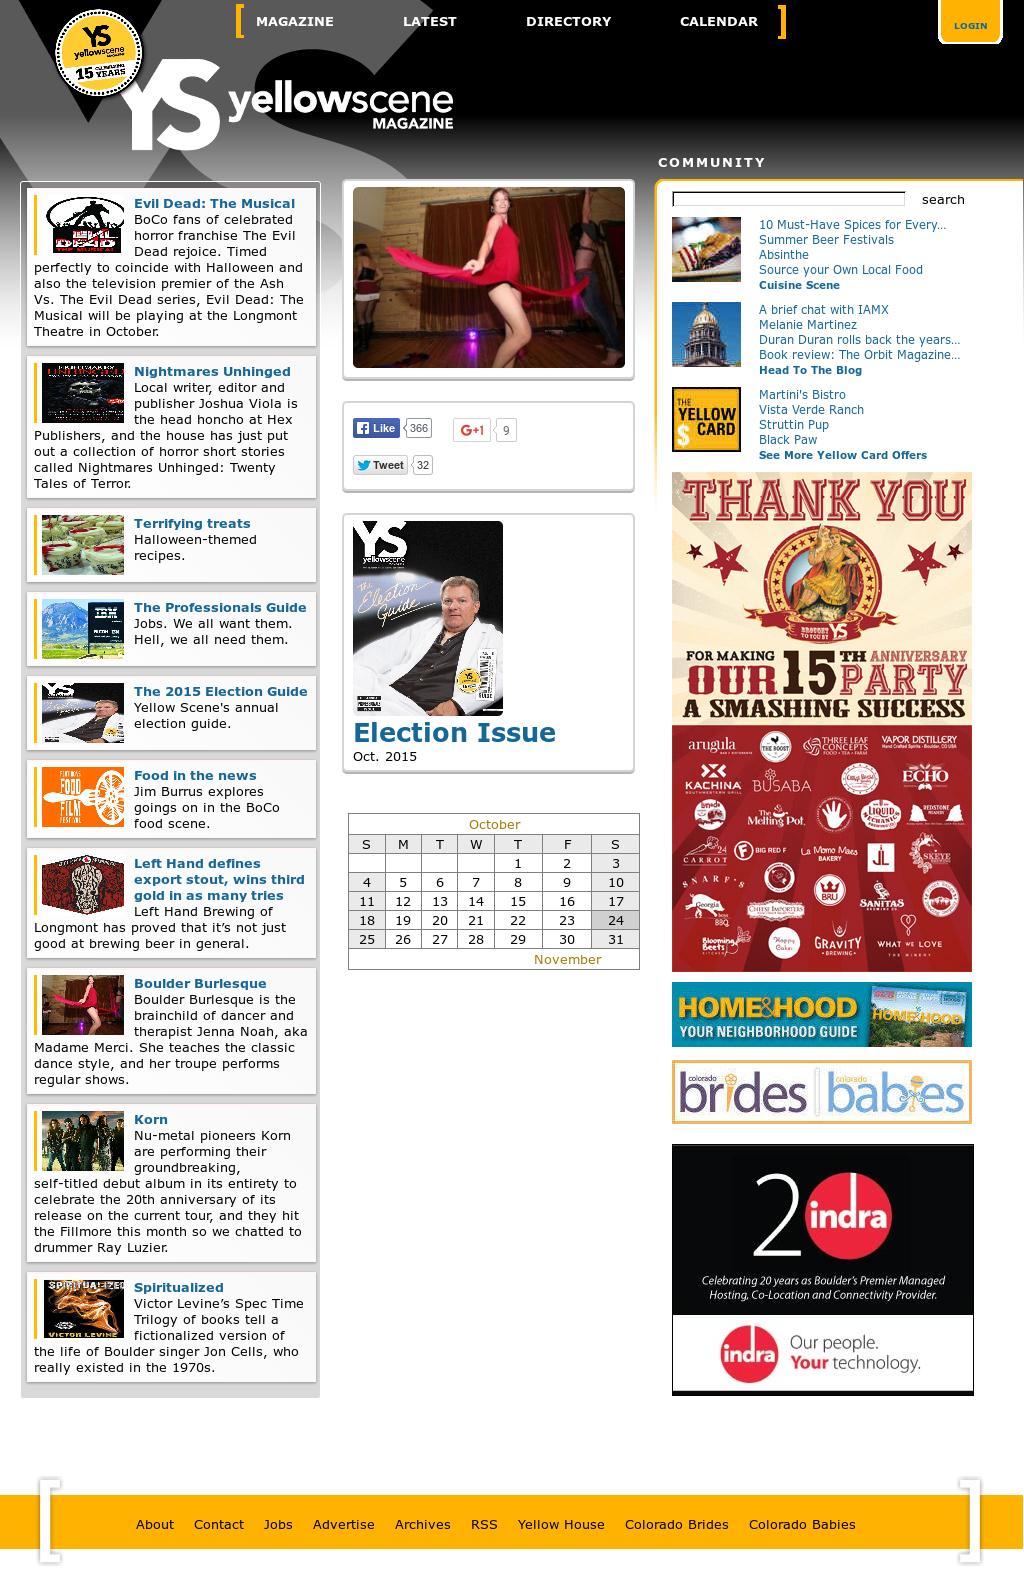 Yellow Scene Magazine Competitors, Revenue and Employees - Owler